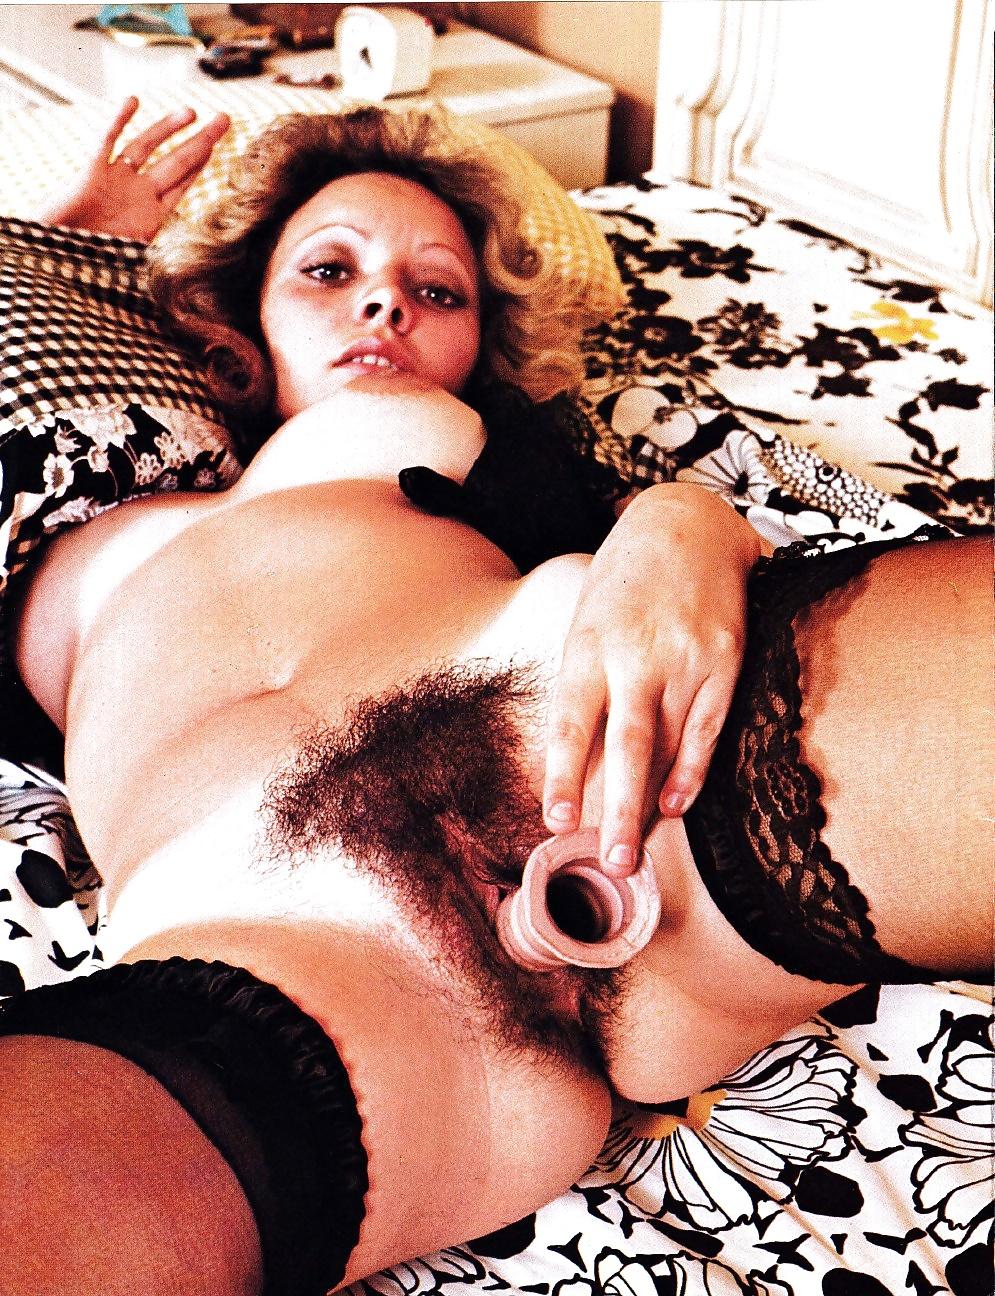 Vintage pussy eating